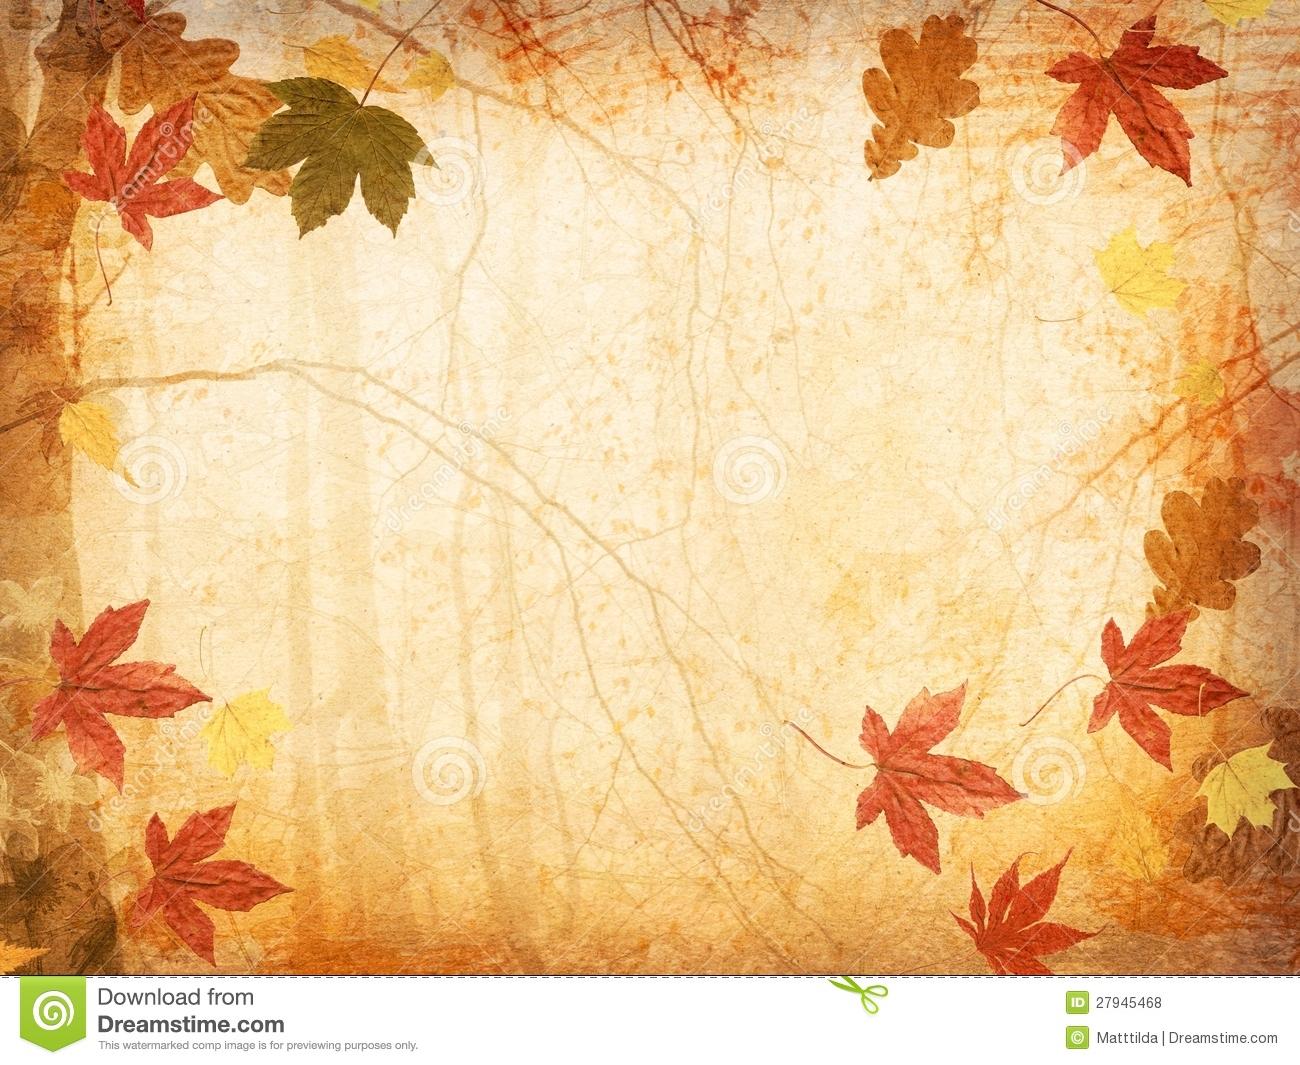 Fall Backgrounds Free - WallpaperSafari